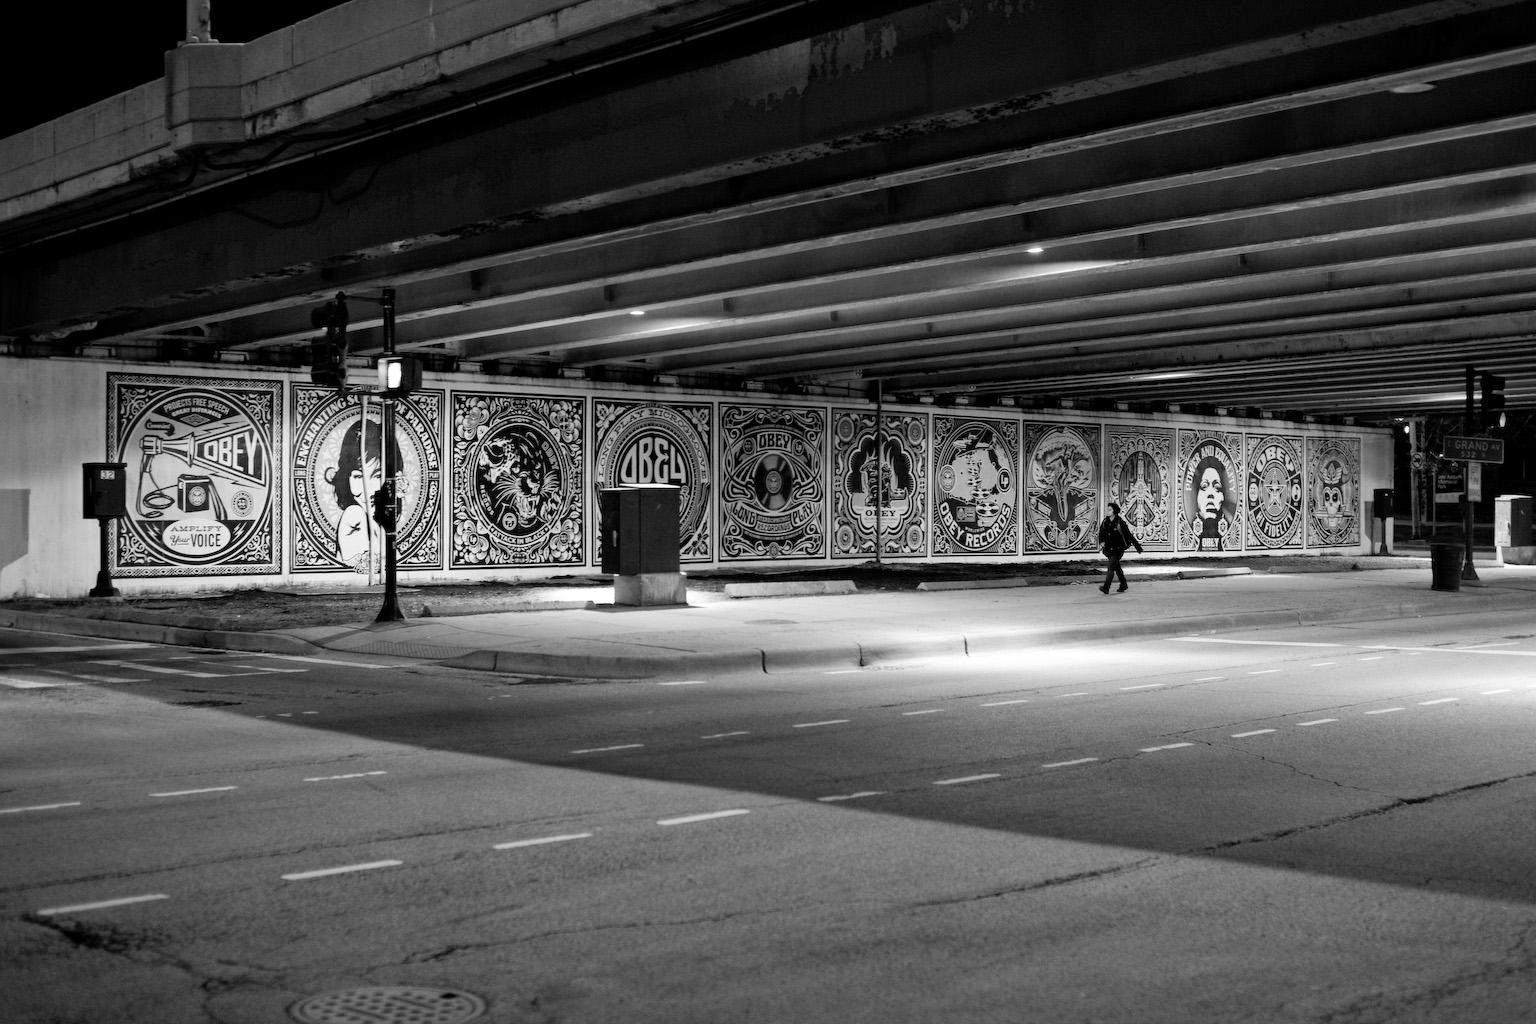 revolutions mural x chicago